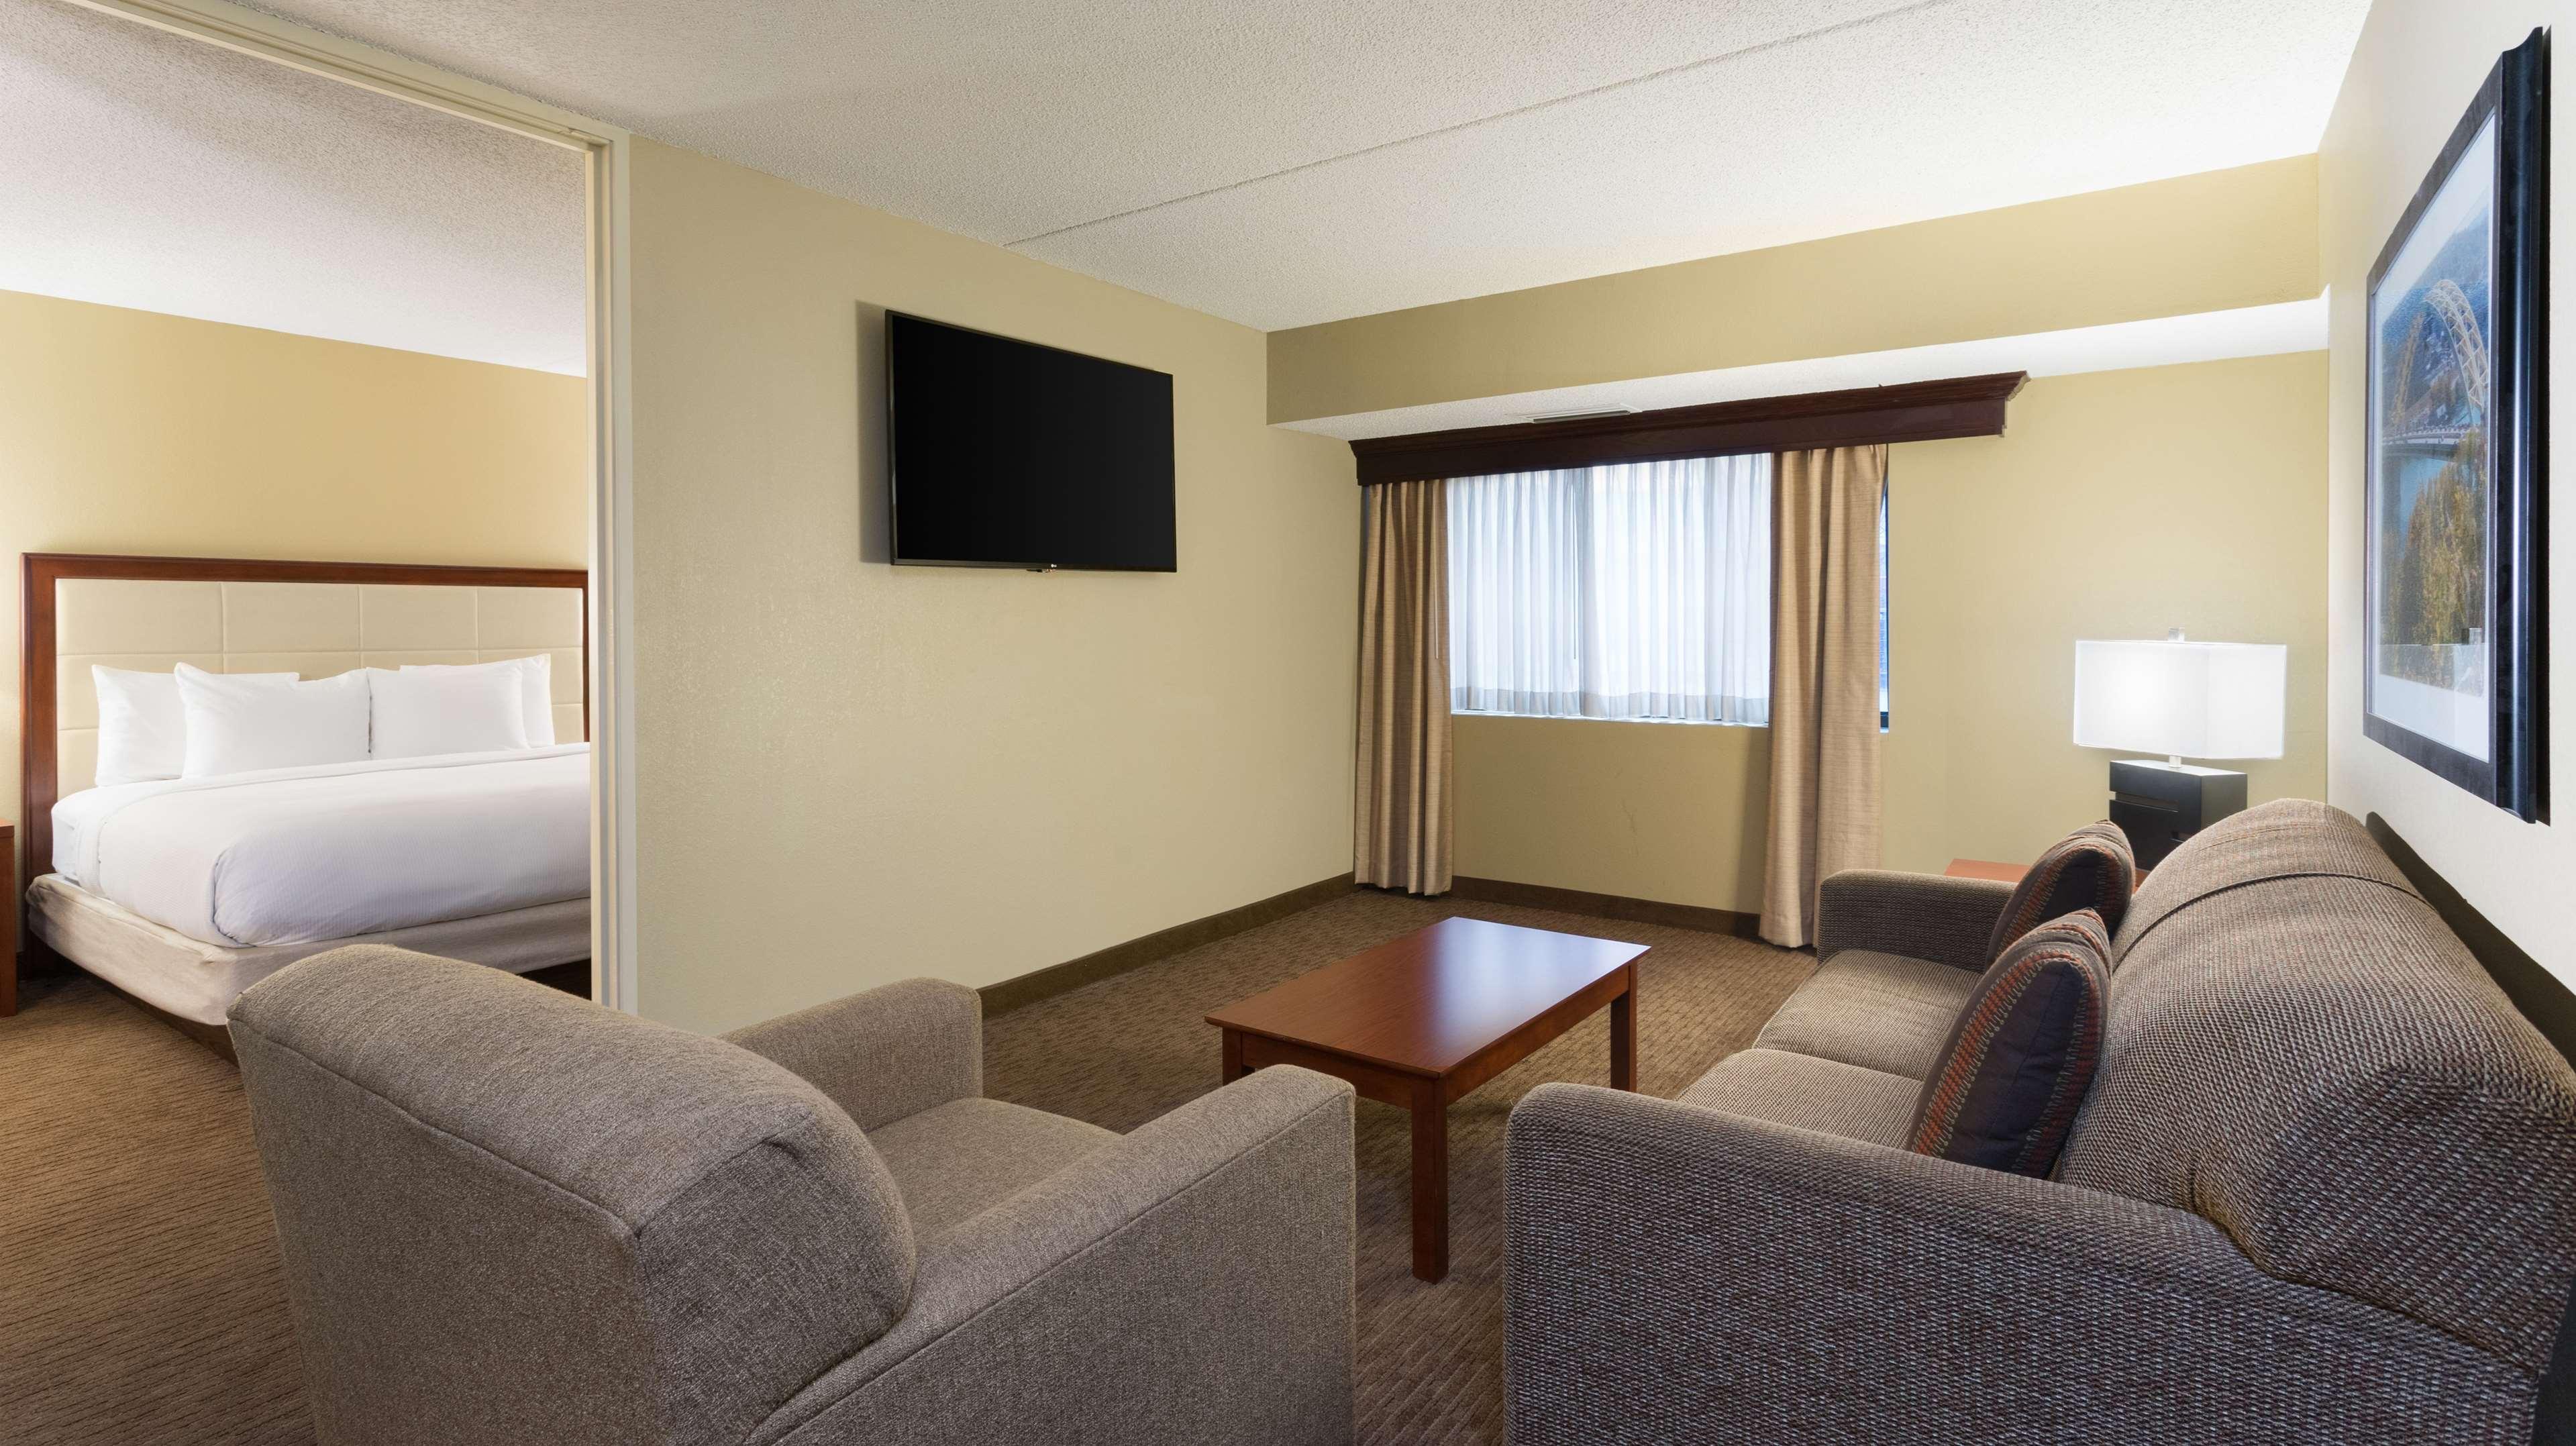 DoubleTree Suites by Hilton Hotel Cincinnati - Blue Ash image 31